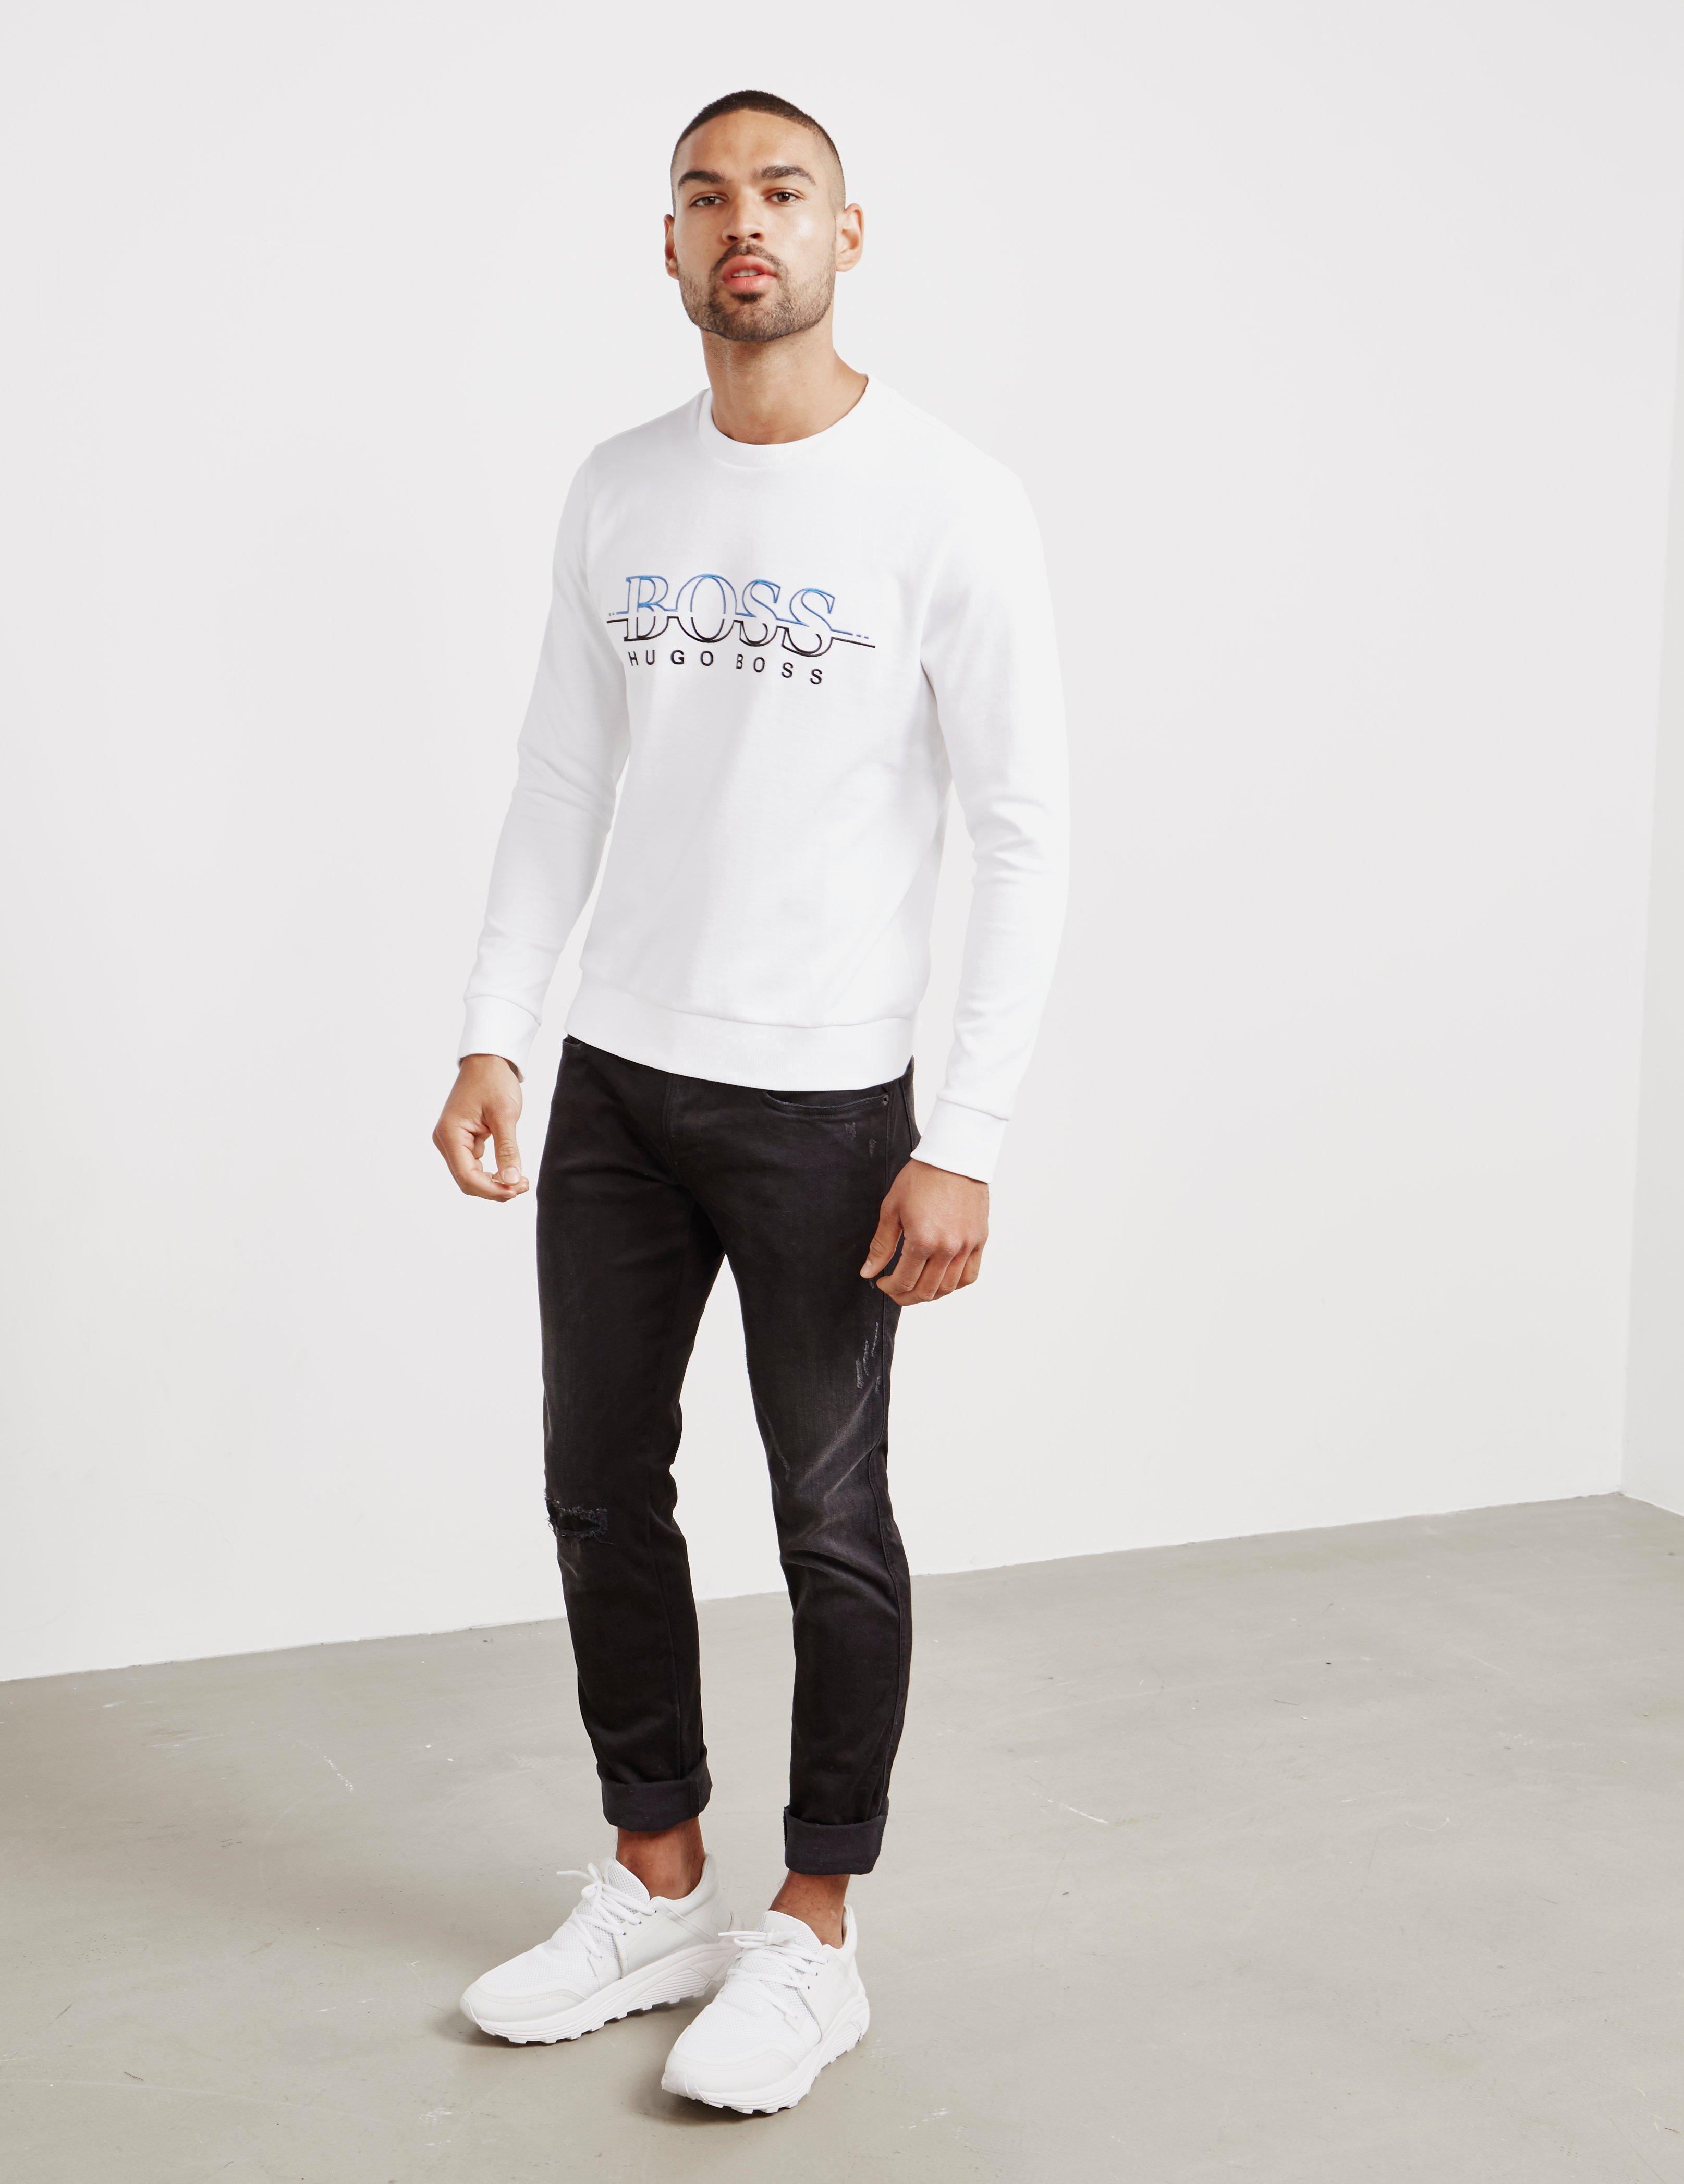 823c40cd2 BOSS Salbo Crew Neck Sweatshirt White in White for Men - Save 51% - Lyst